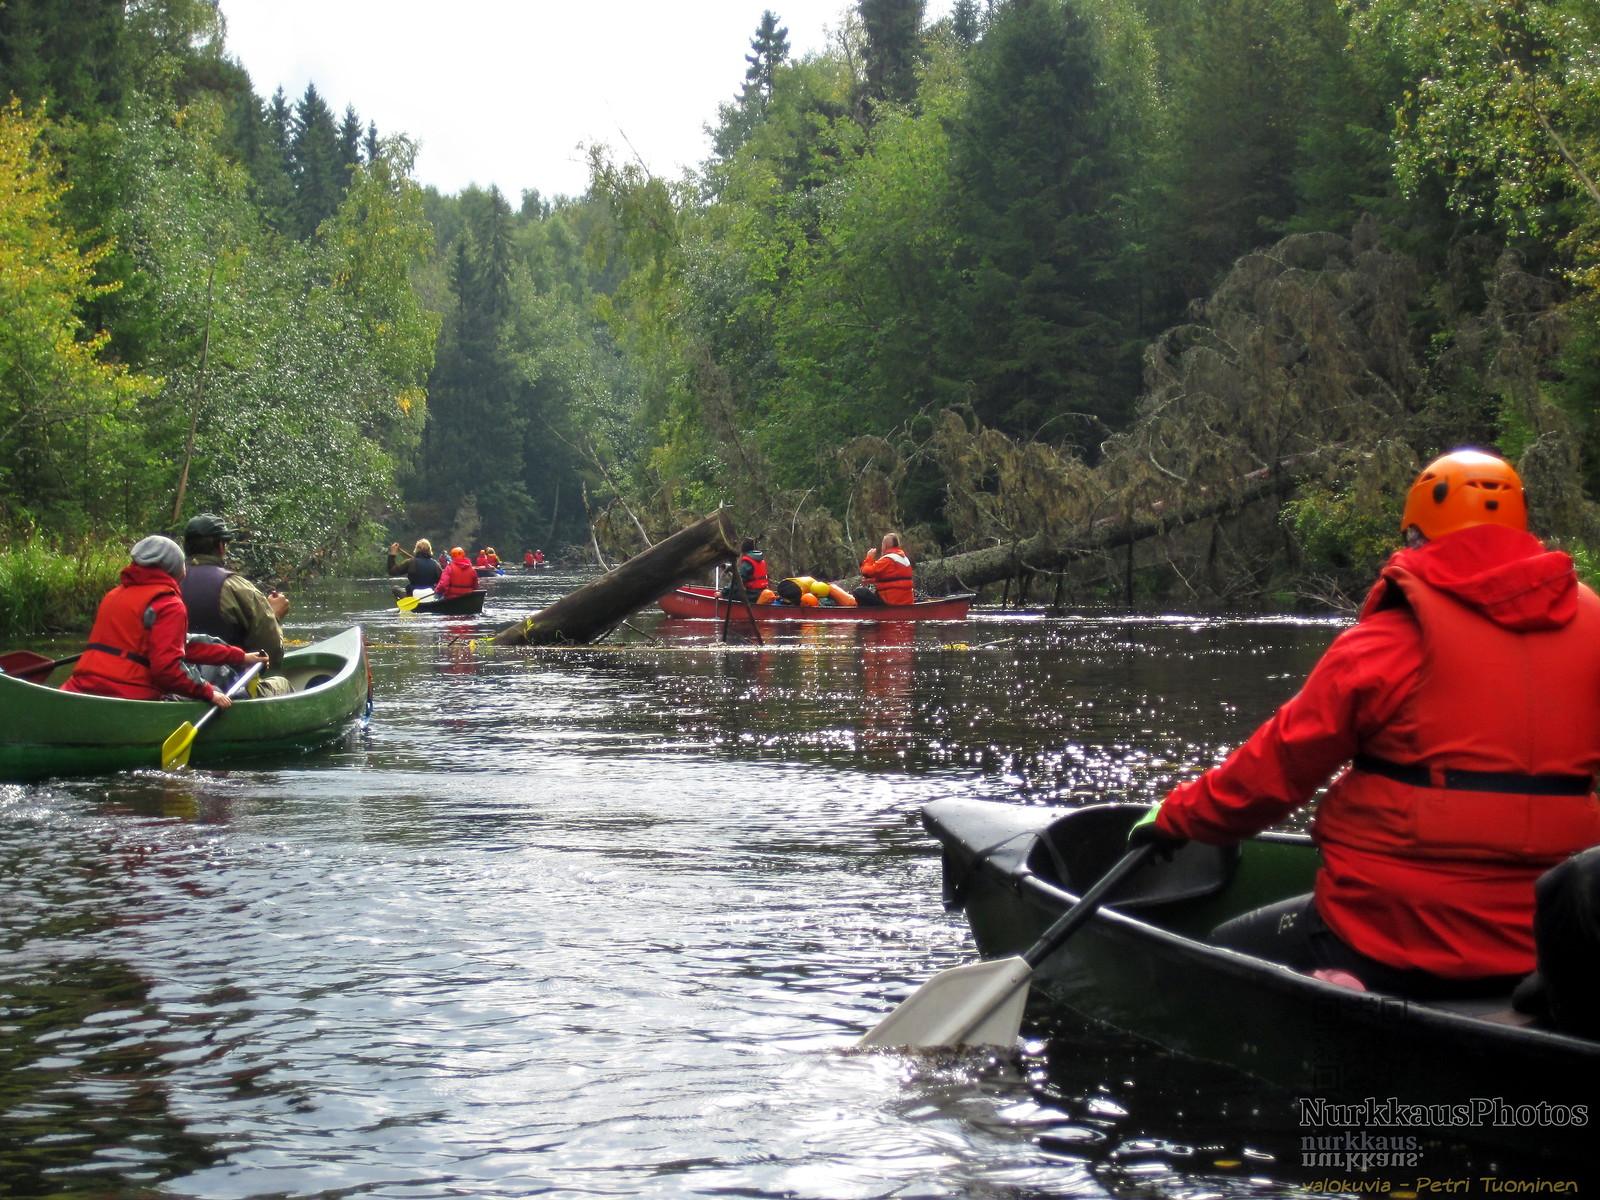 Paddling at Vääräjoki